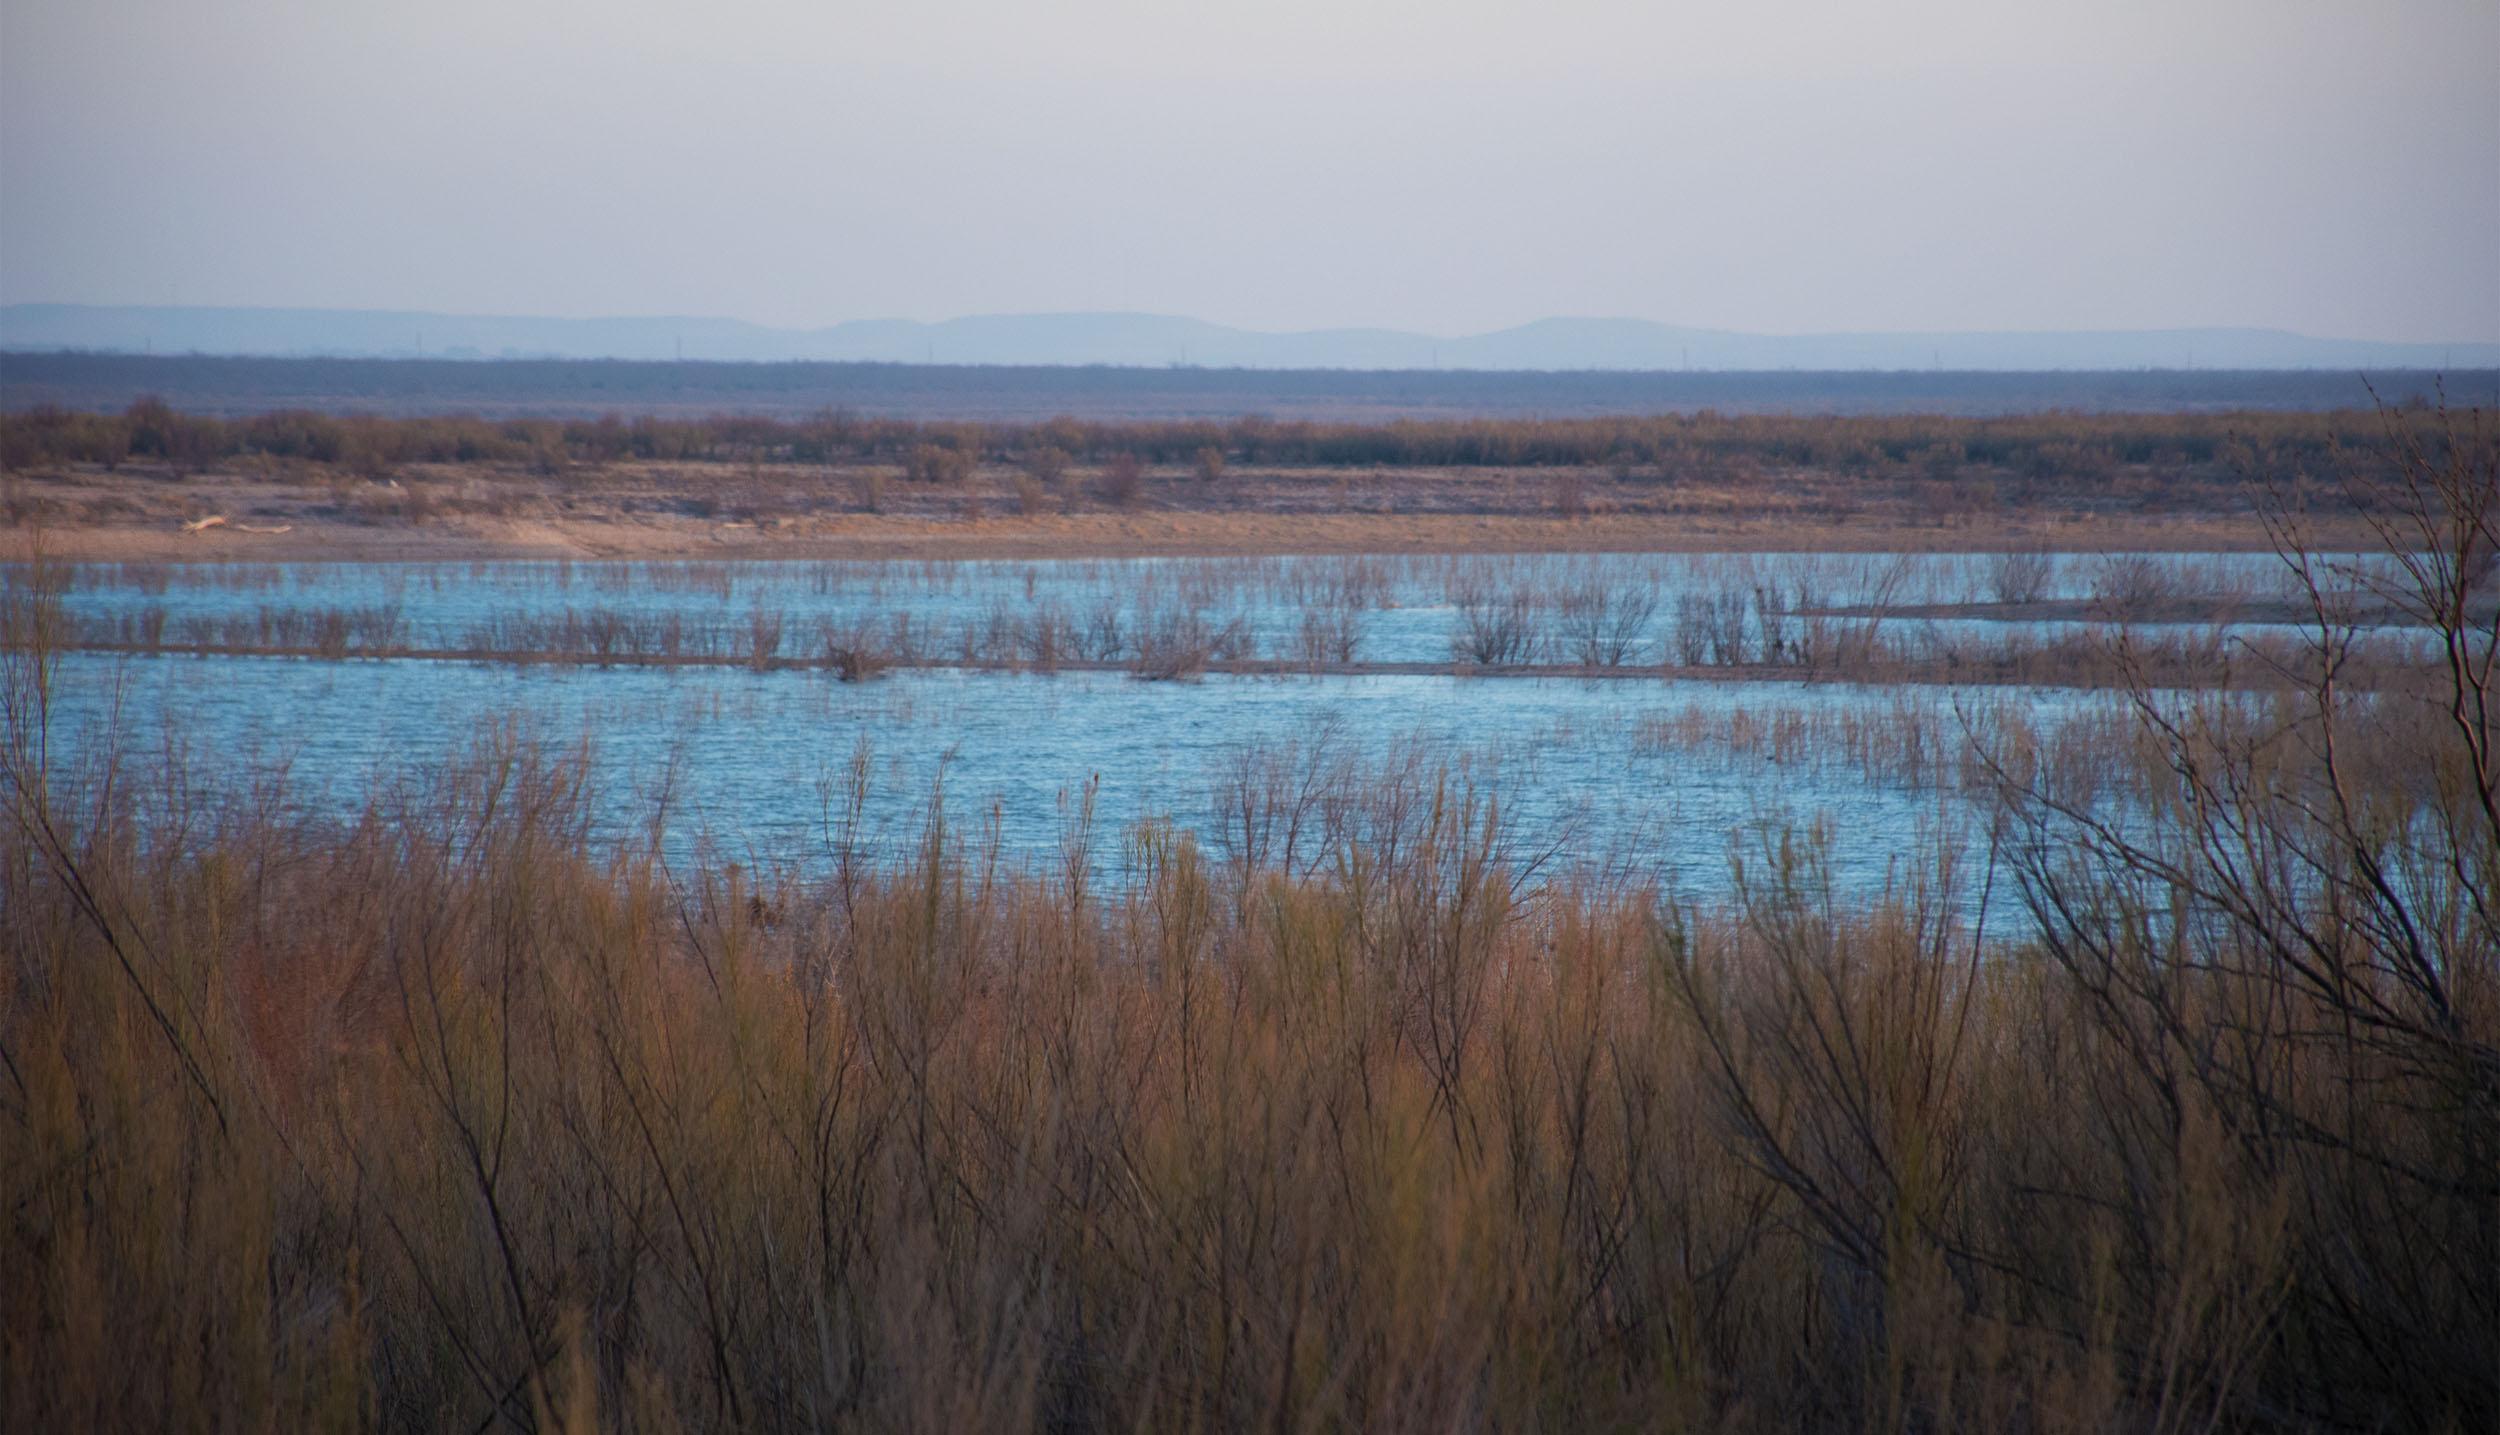 Twin Buttes Reservoir